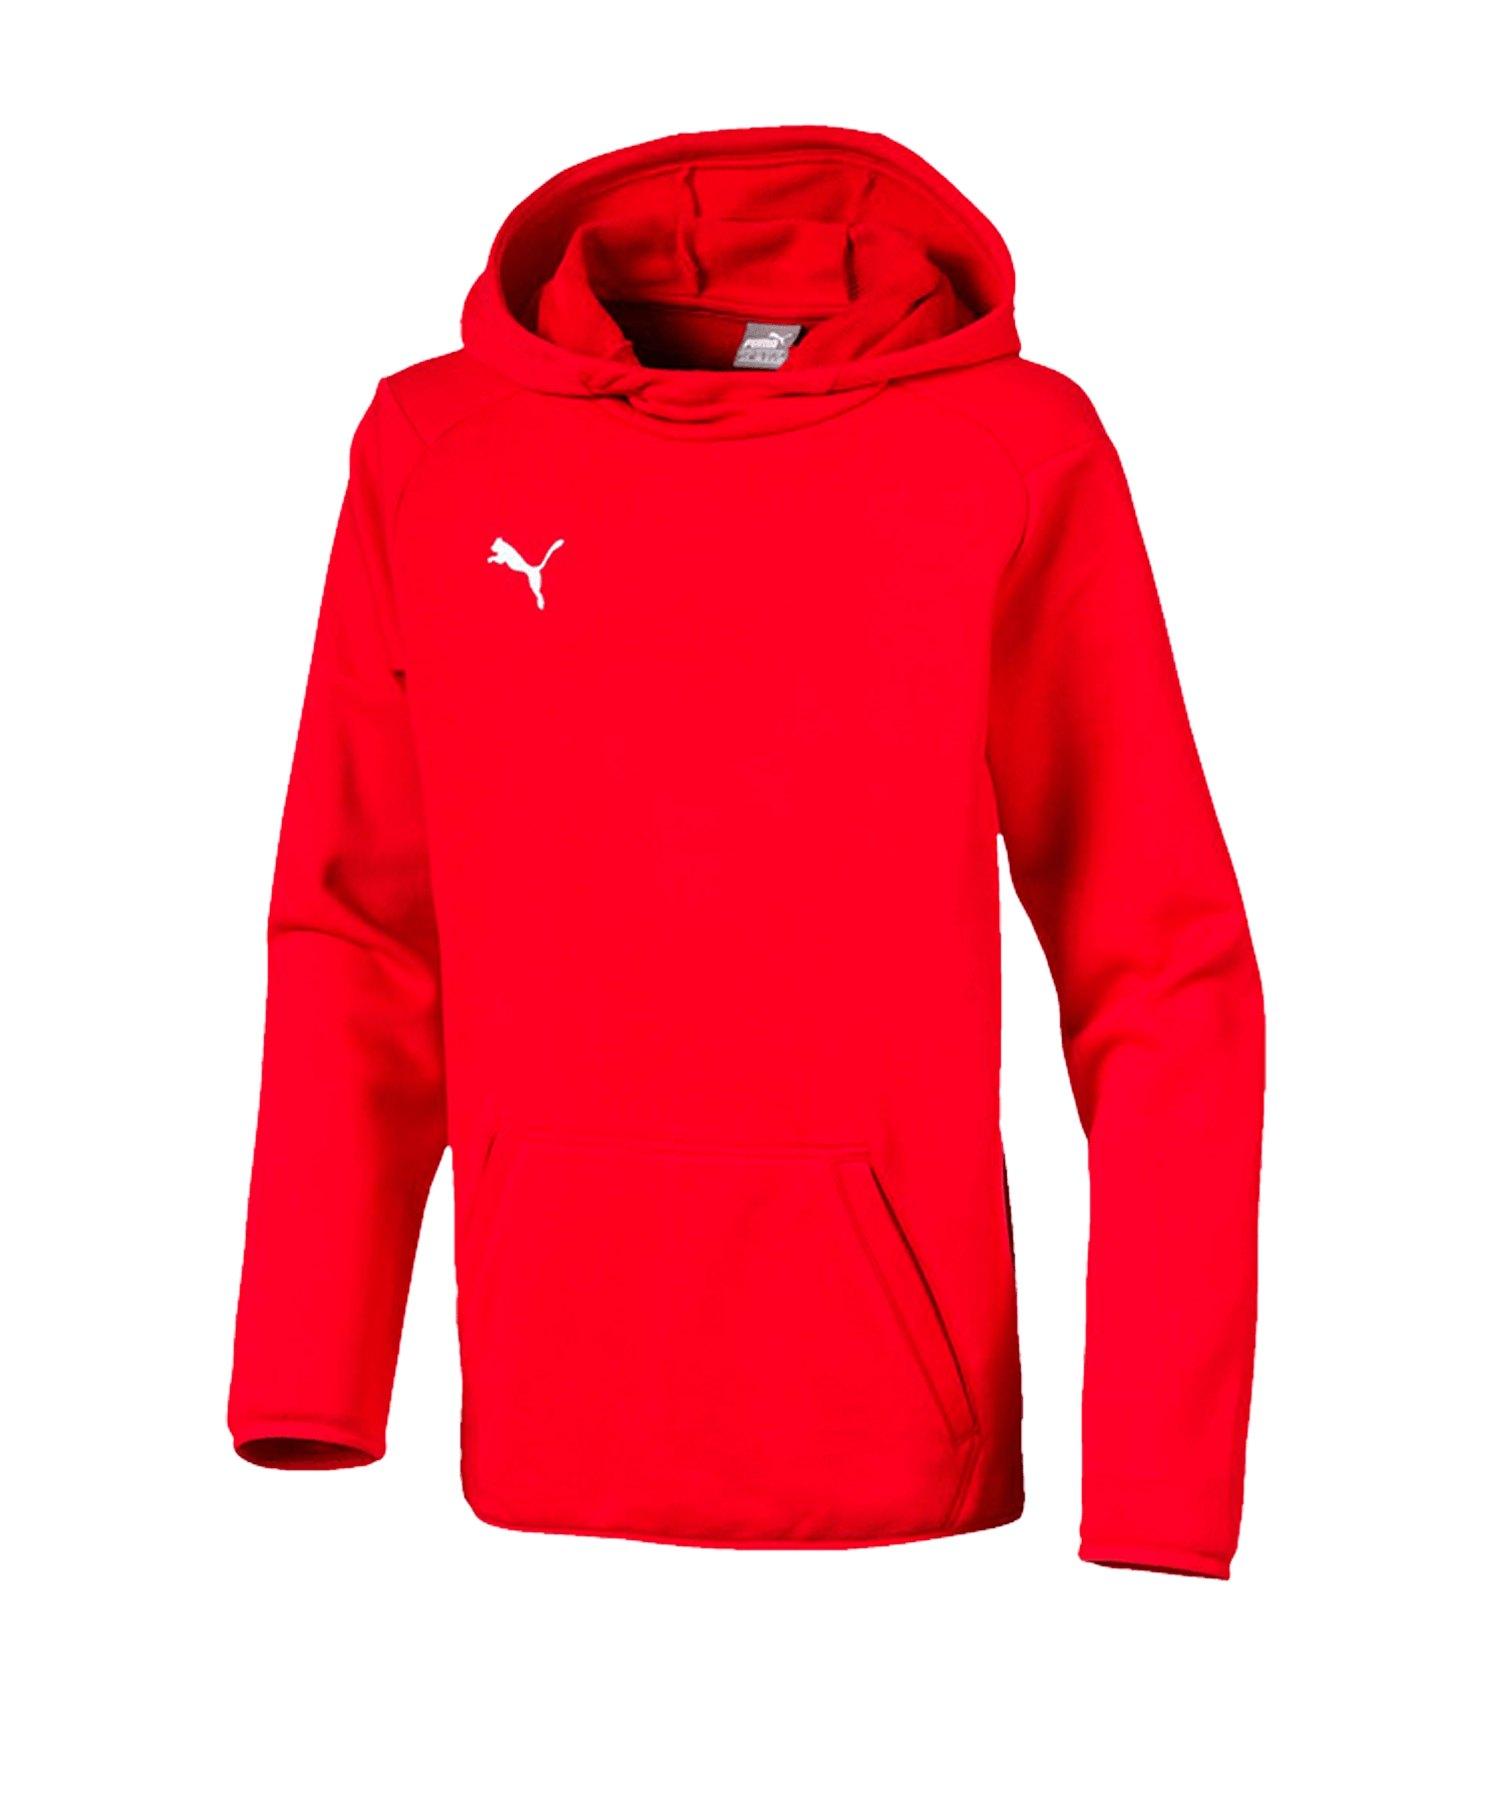 PUMA LIGA Casuals Kapuzensweatshirt Kids Rot F01 - rot